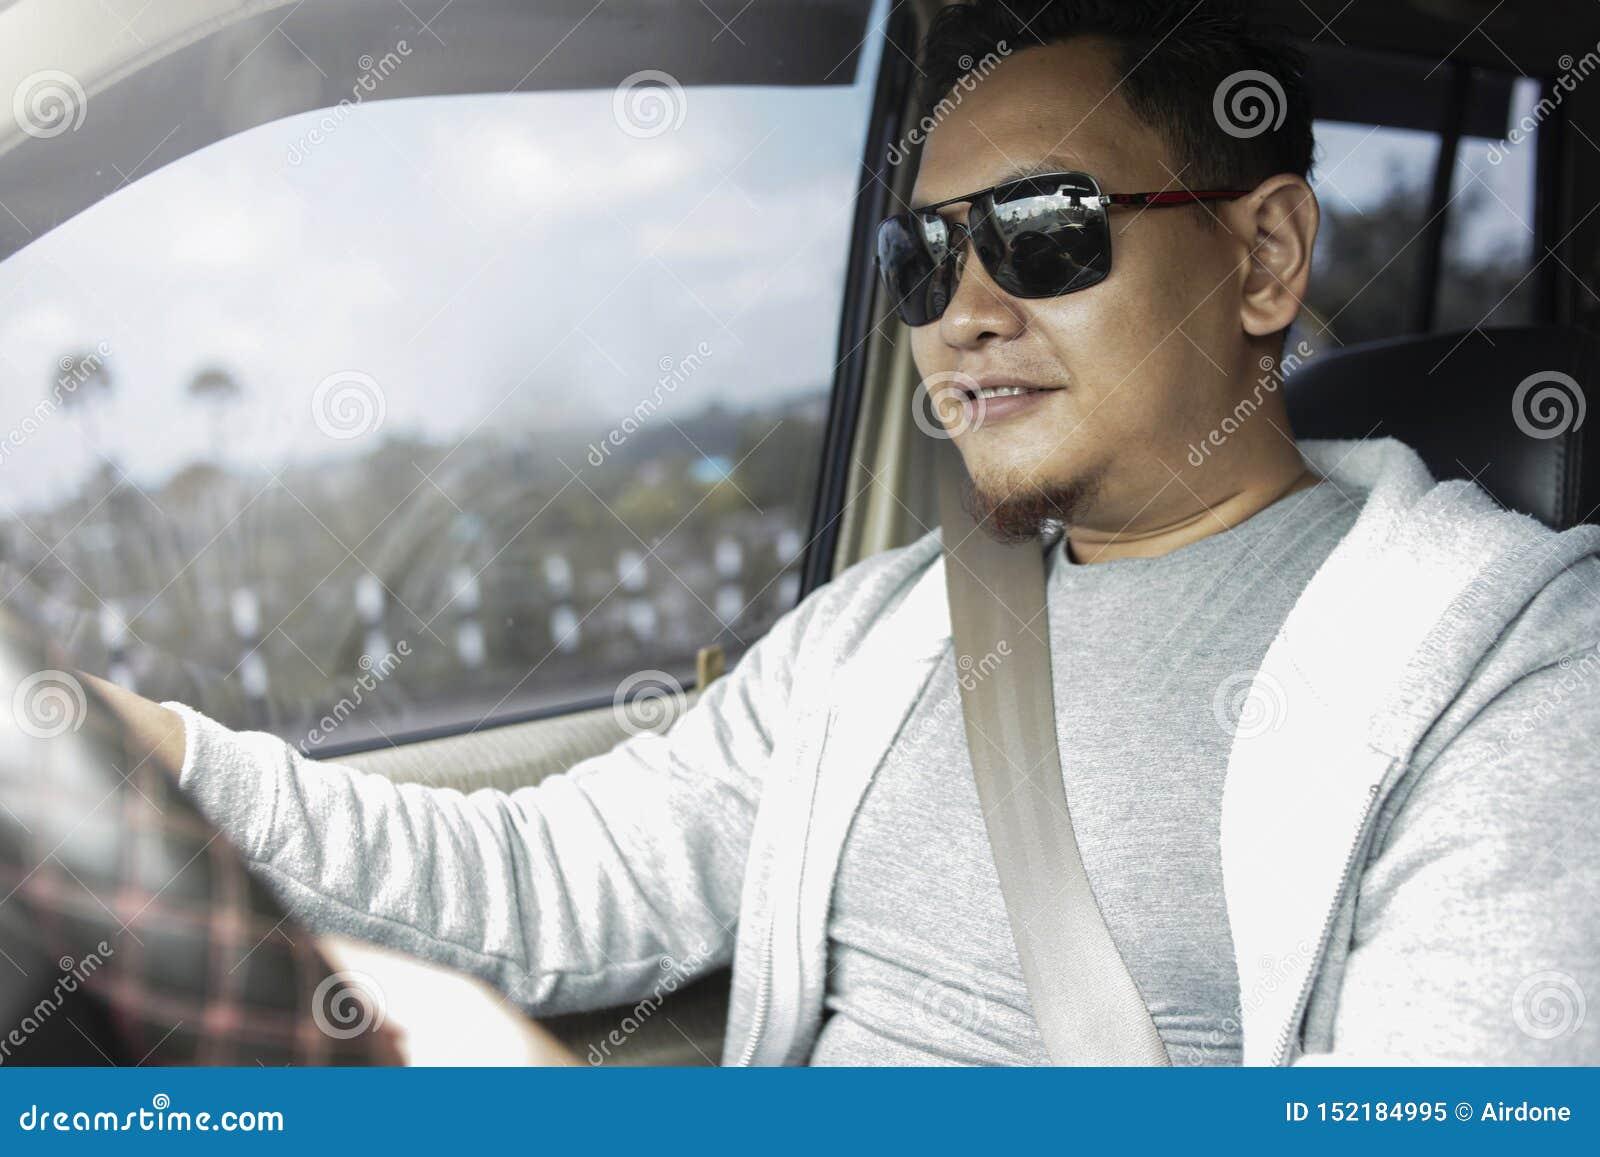 Young Asian Man Driving a Car